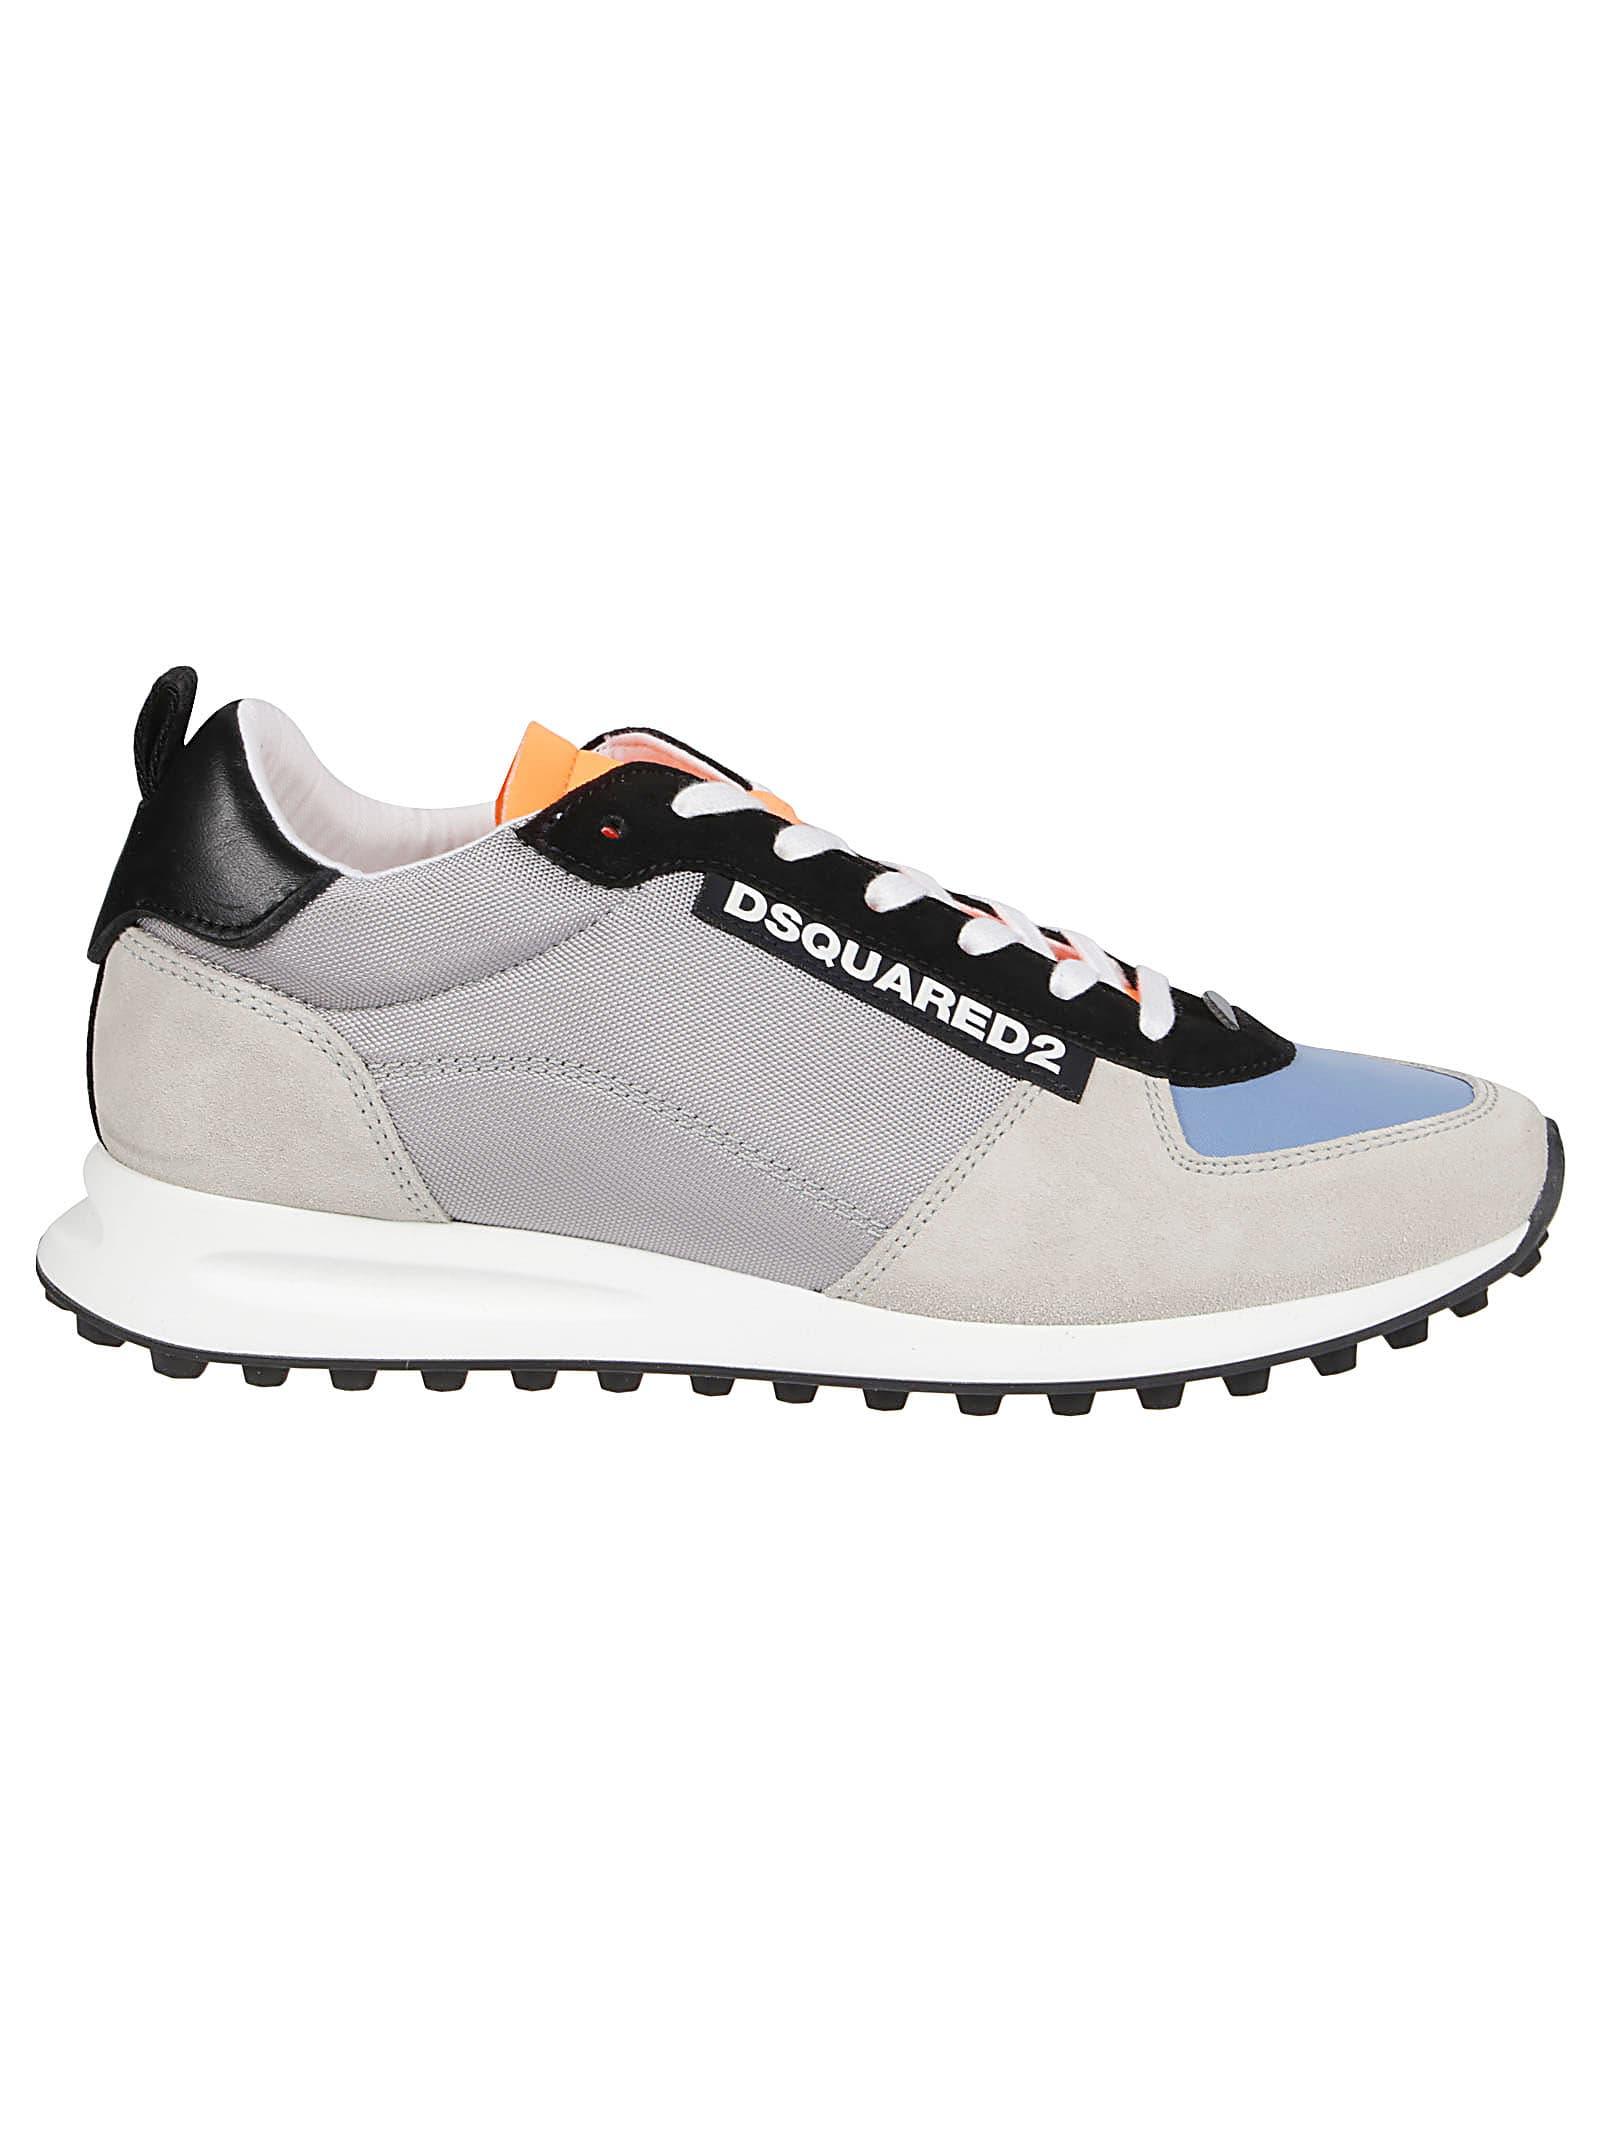 Dsquared2 Sneaker from Dsquared2Composition: 75% Polyester, 10% Calf Leather, 8% Nylon, 5% Polyethylene, 2% Elastane